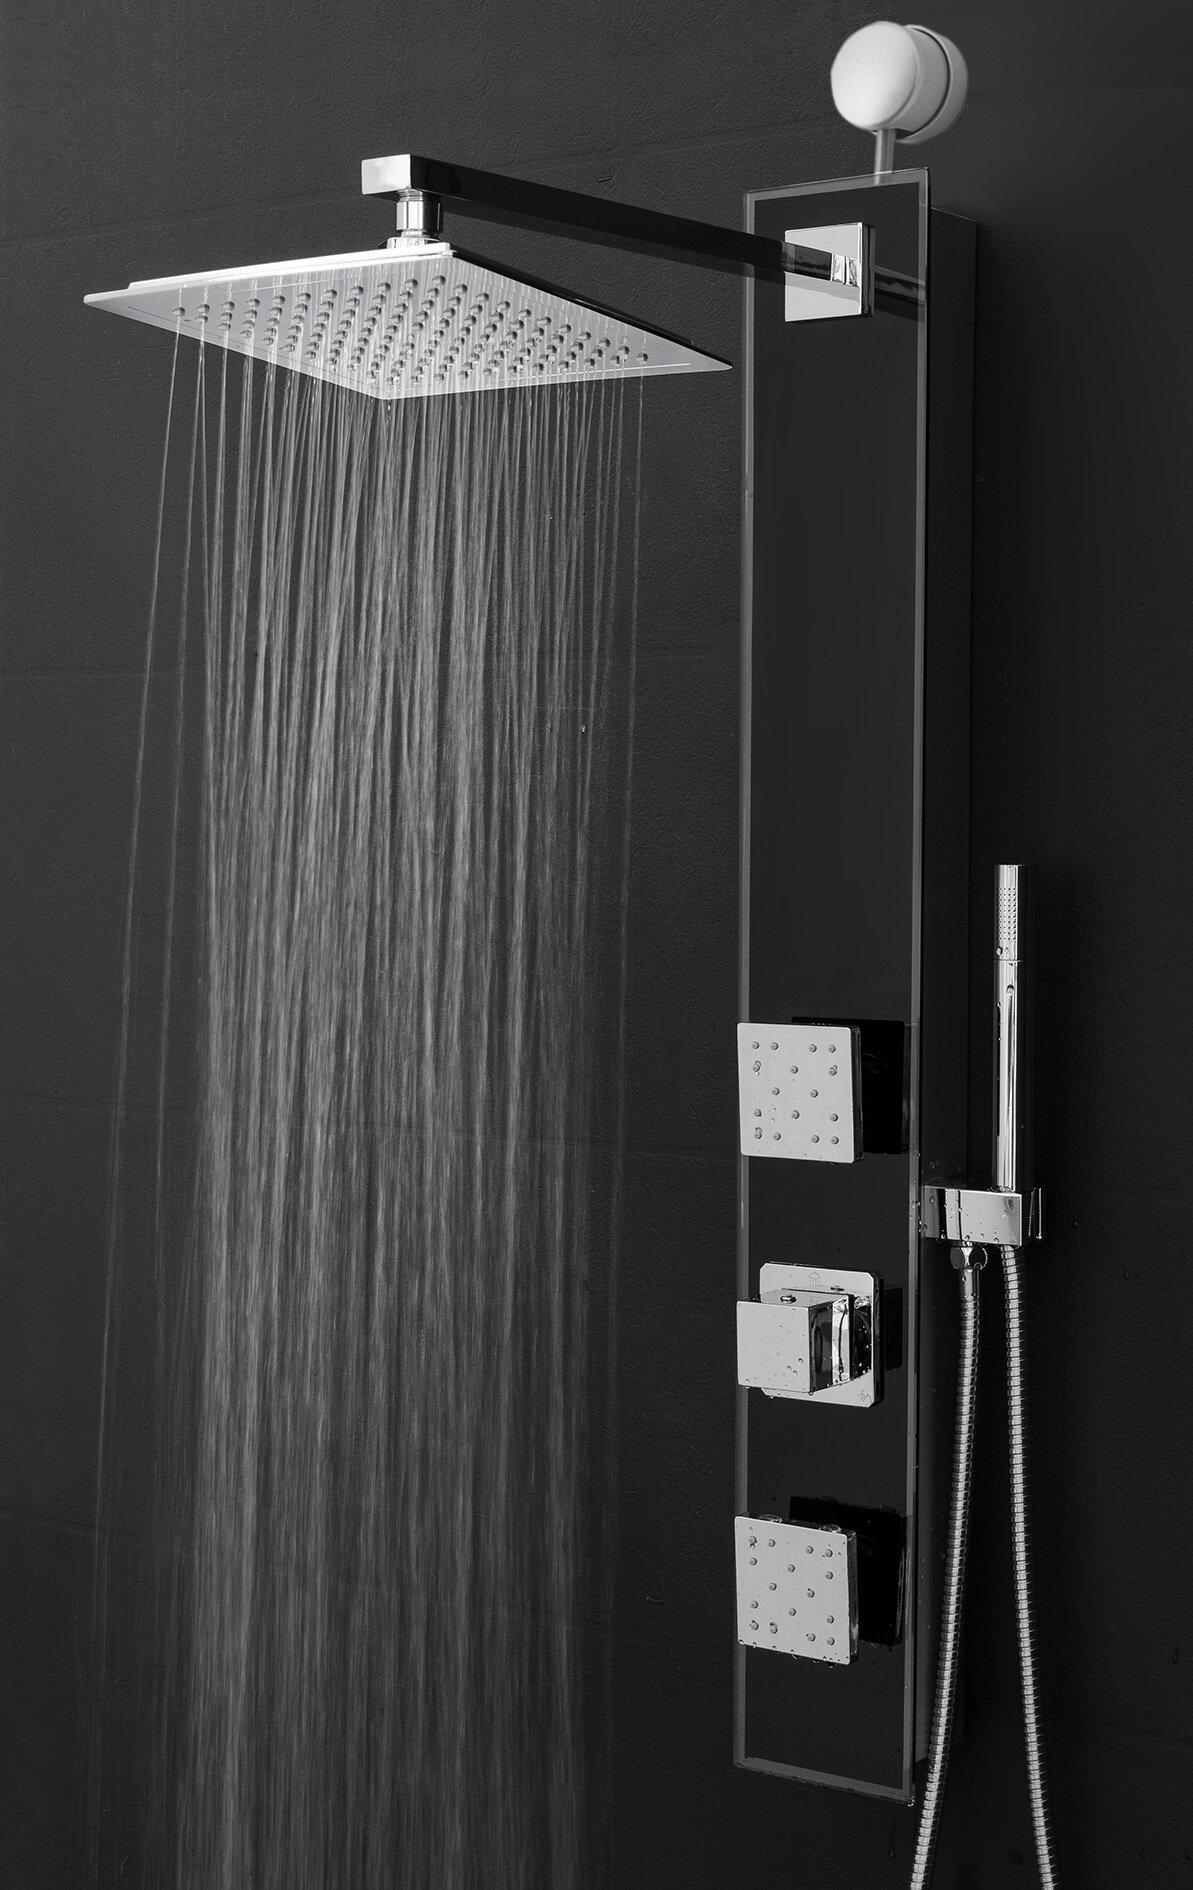 Akdy Diverter Rain Shower Head Shower Panel With Massage Function